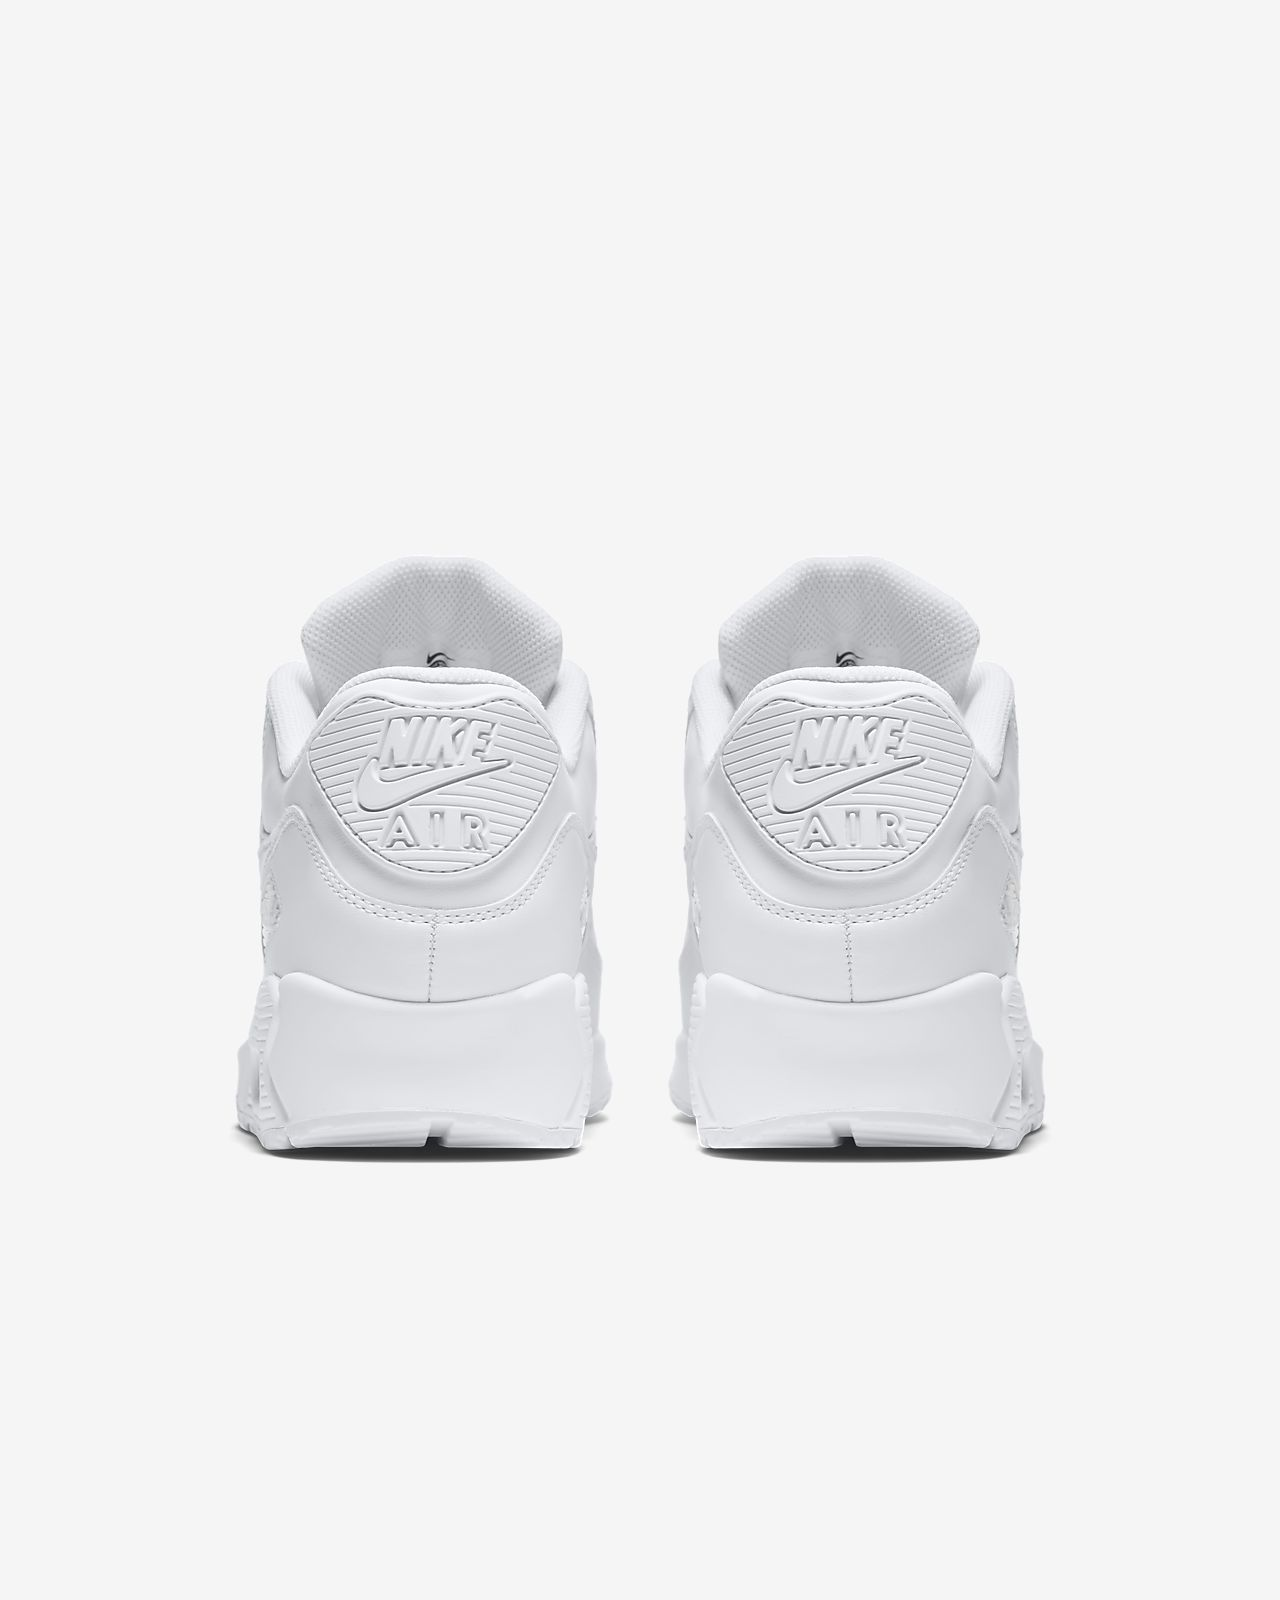 0eac2d5d Мужские кроссовки Nike Air Max 90 Leather. Nike.com RU